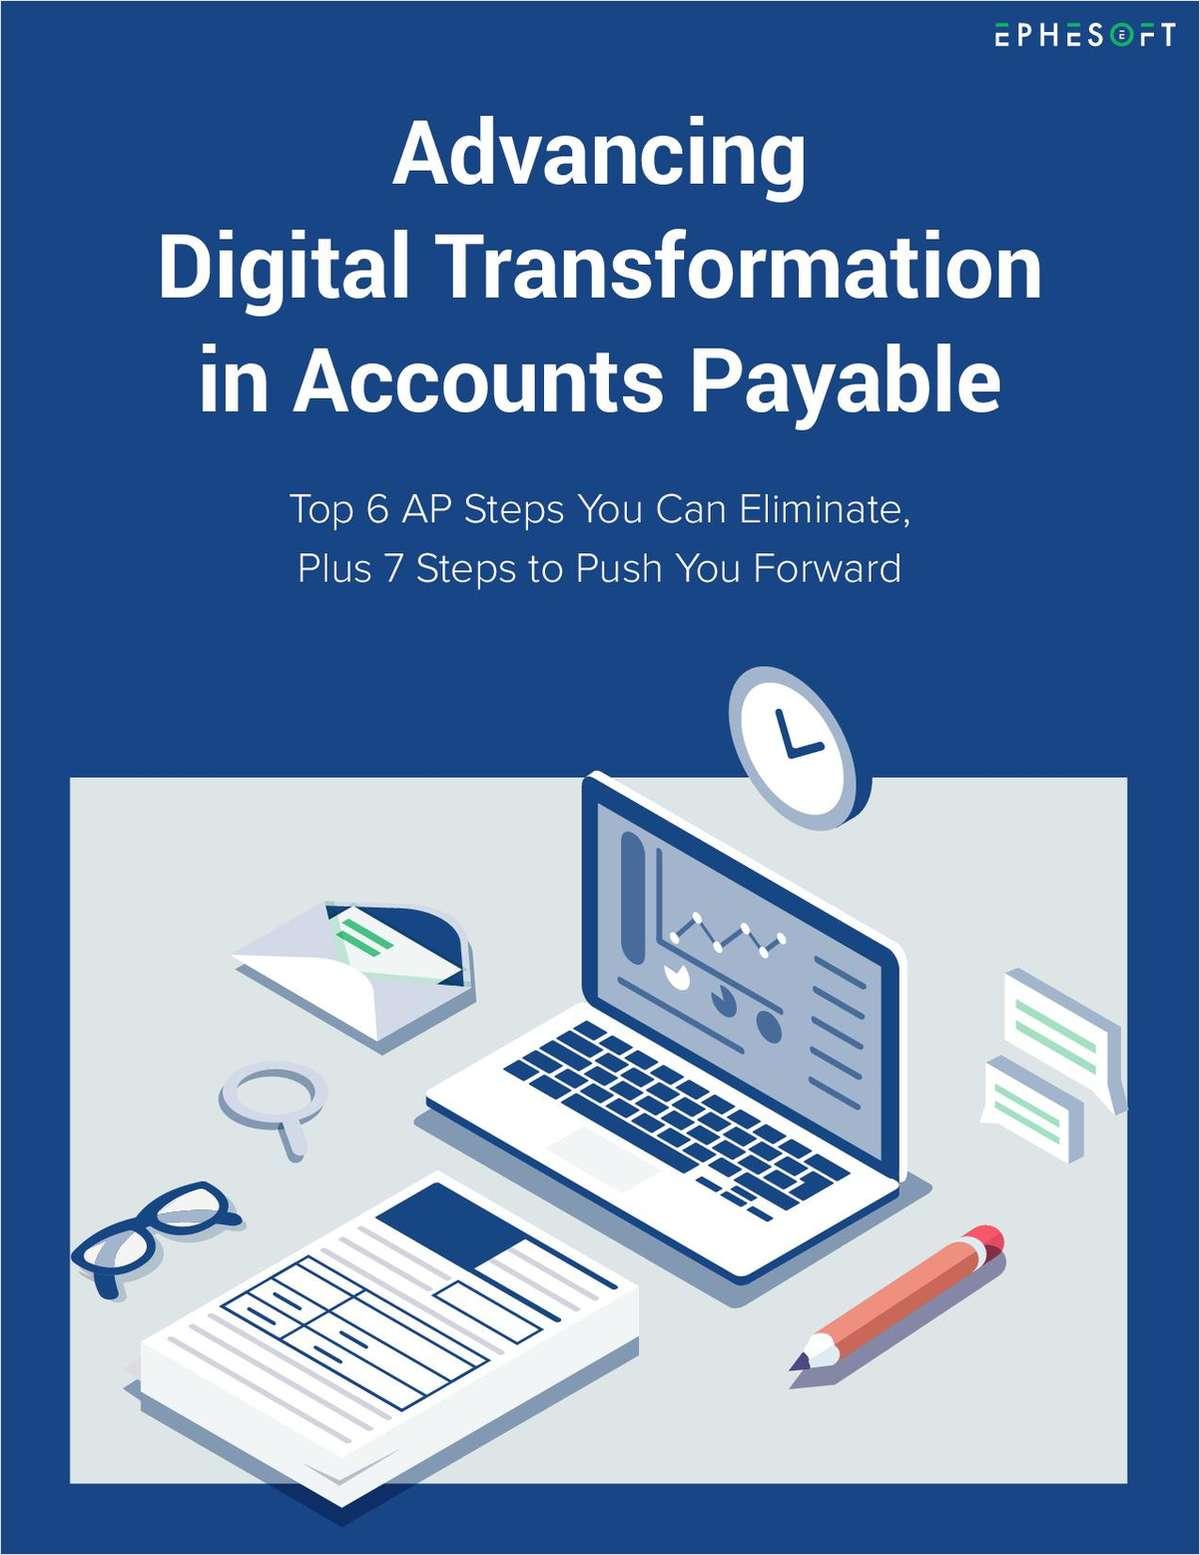 Advancing Digital Transformation in Accounts Payable